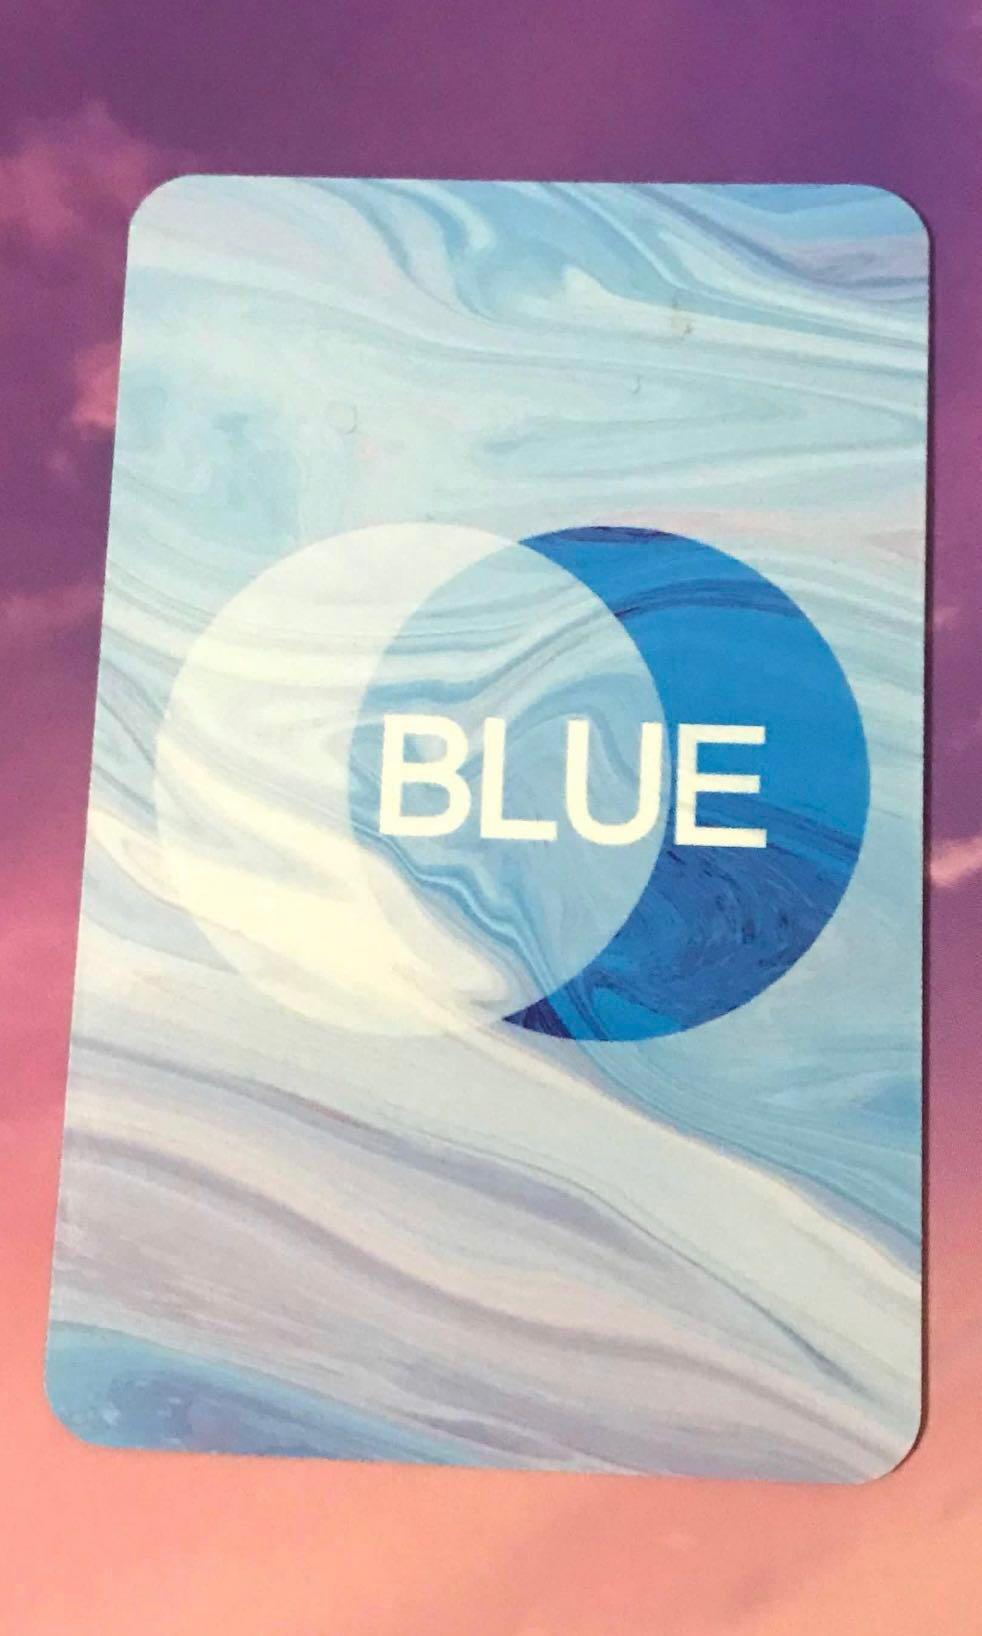 B.A.P Young Jae Blue Honeymoon Single Album Official Photocard